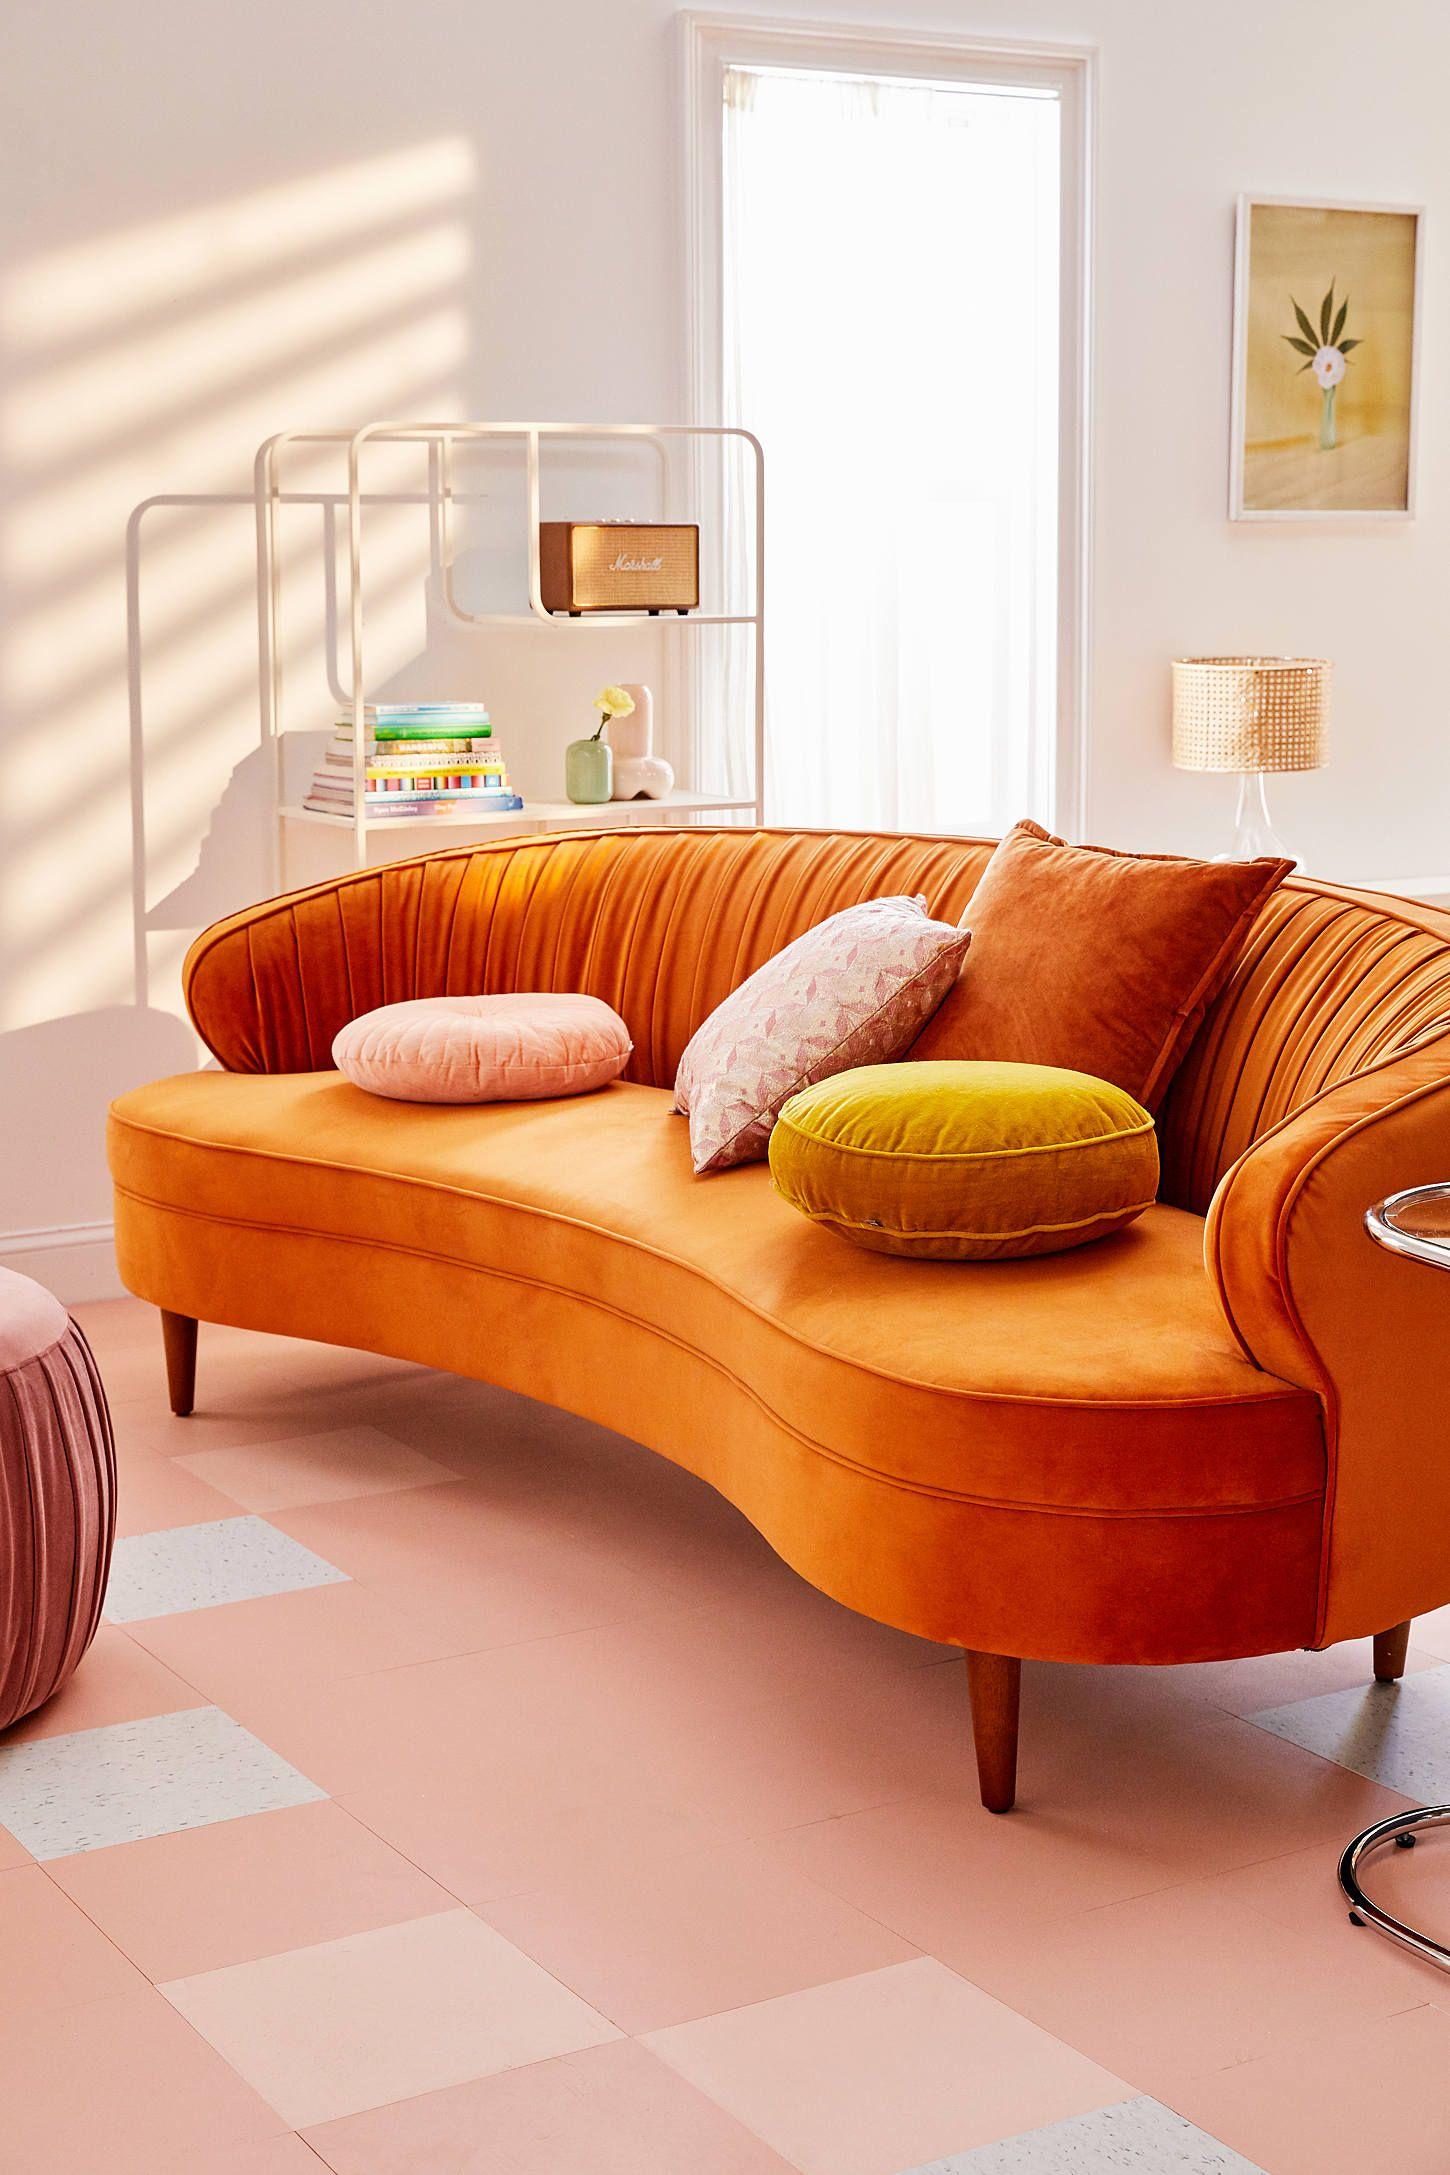 Camila Velvet Sofa Spring Furniture Curved Sofa Couches Living Room #orange #sofa #living #room